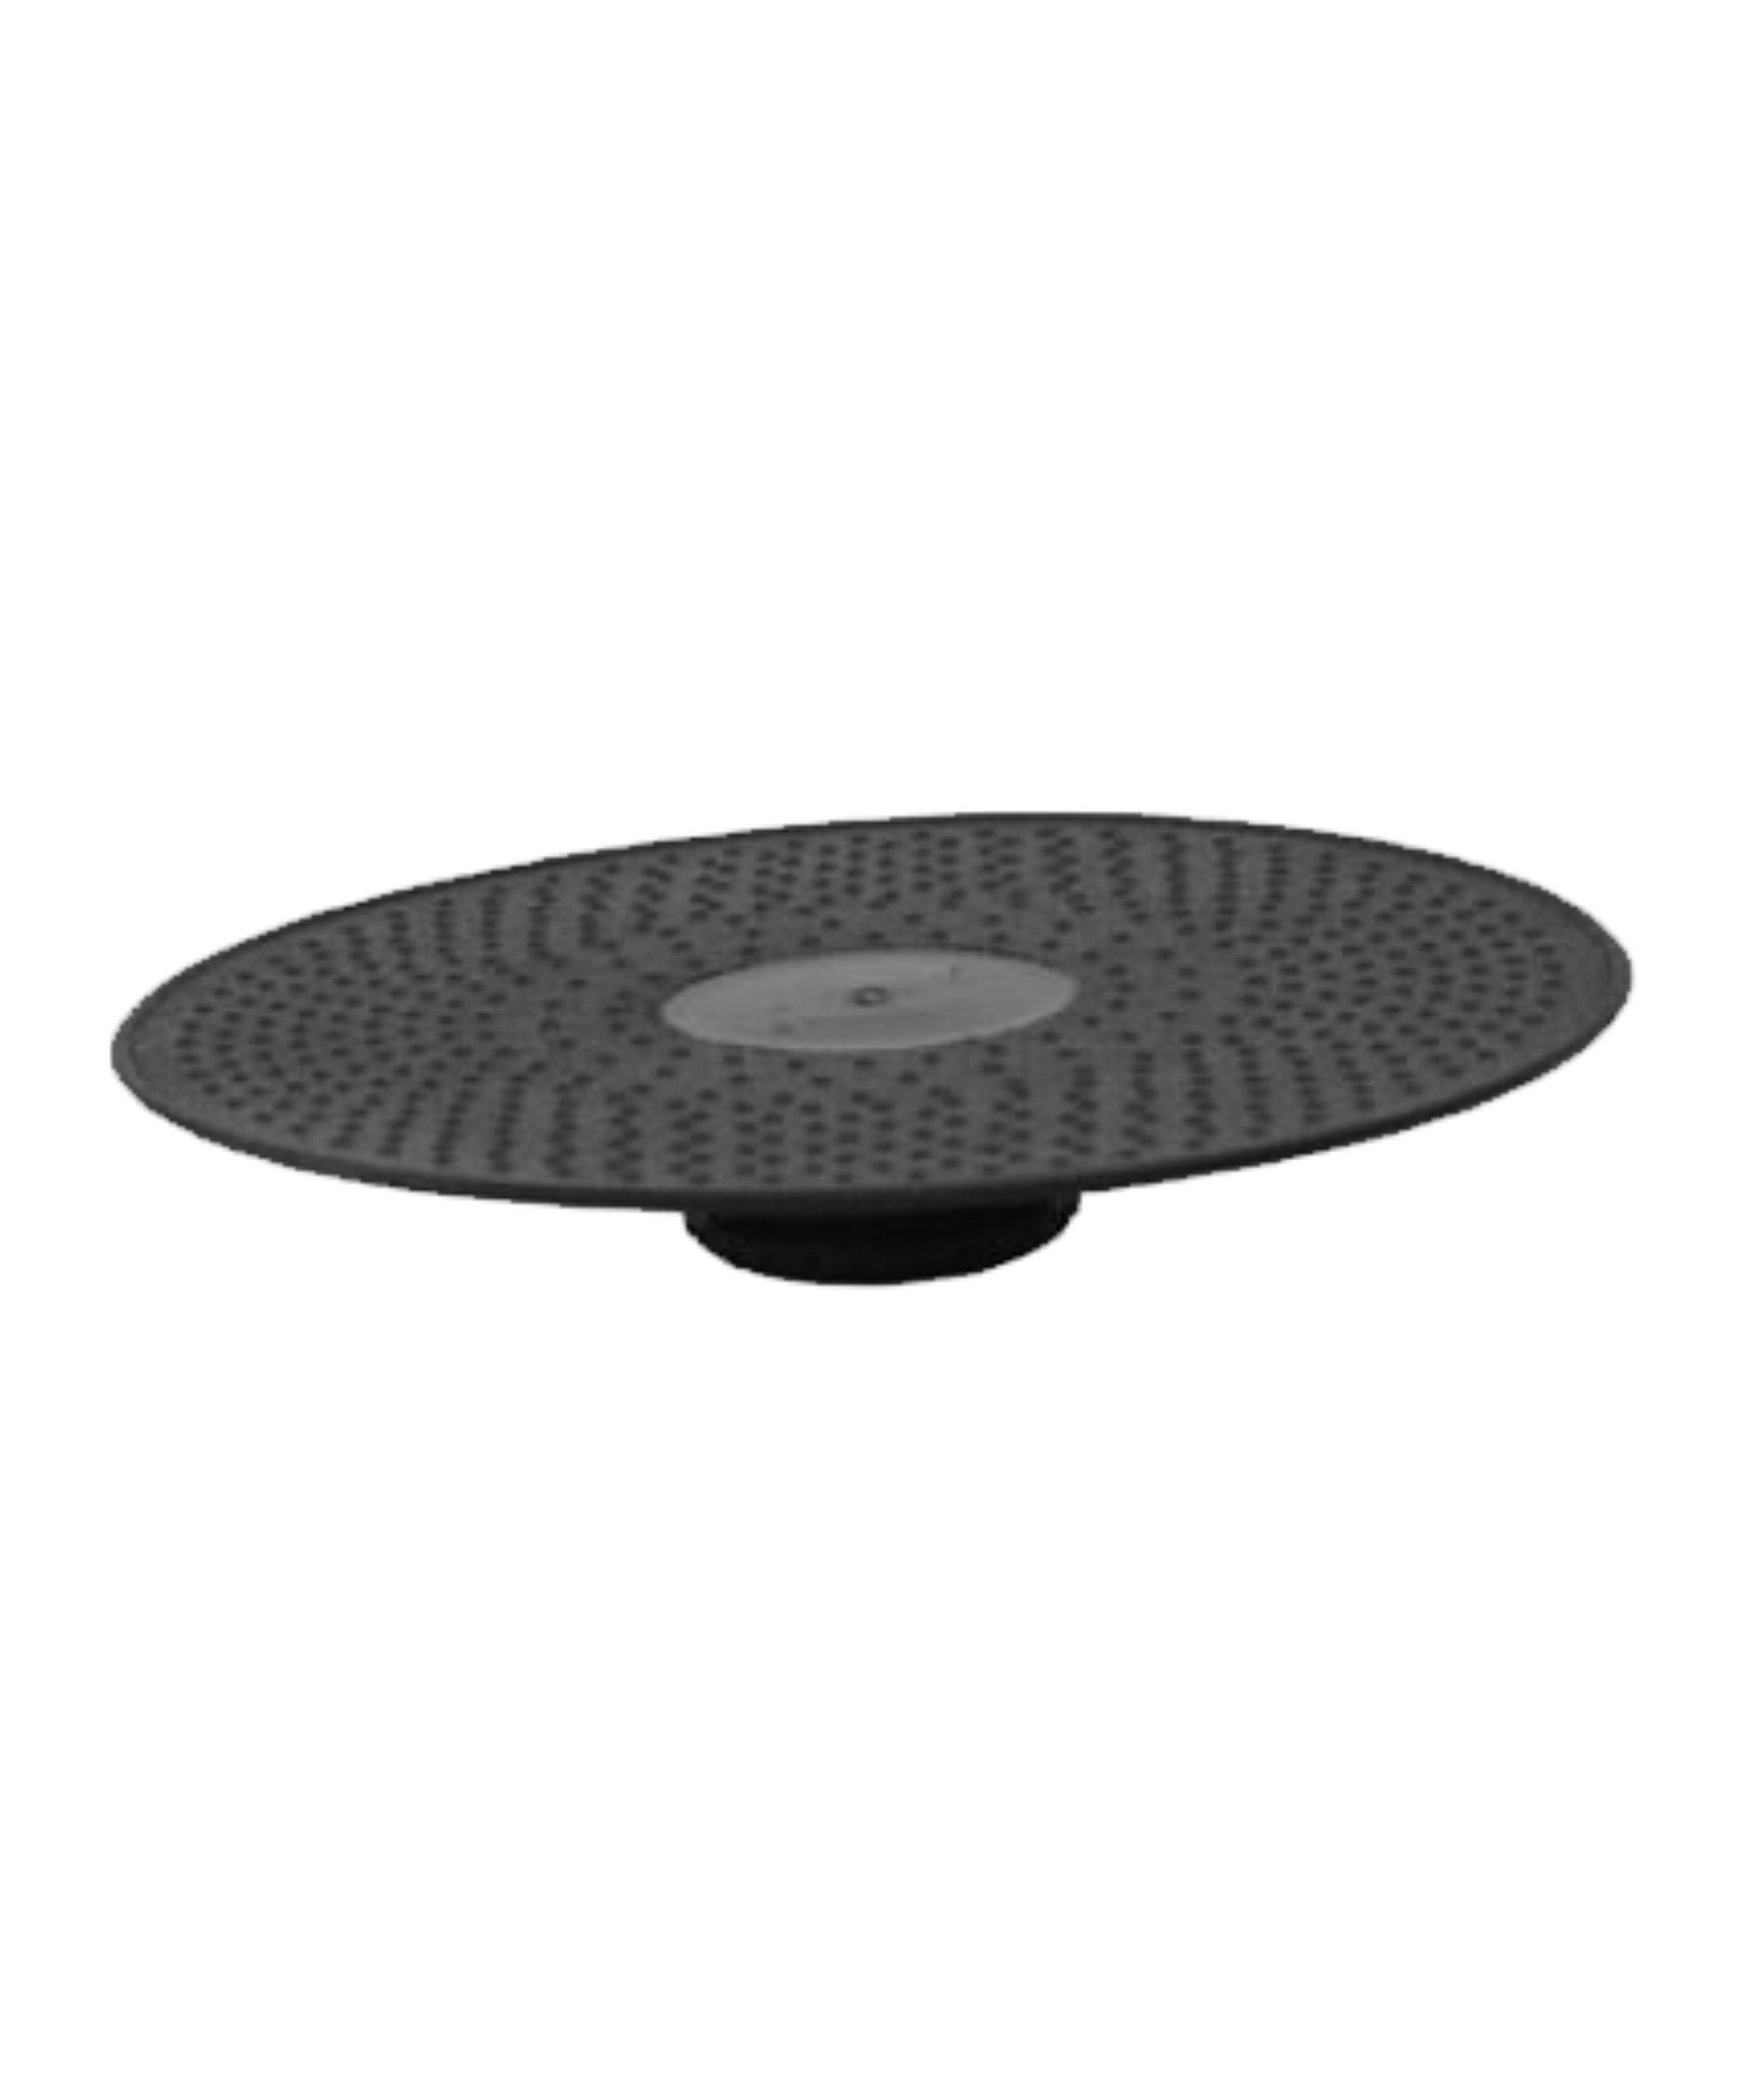 Cawila Balance Board d40cm Schwarz - schwarz